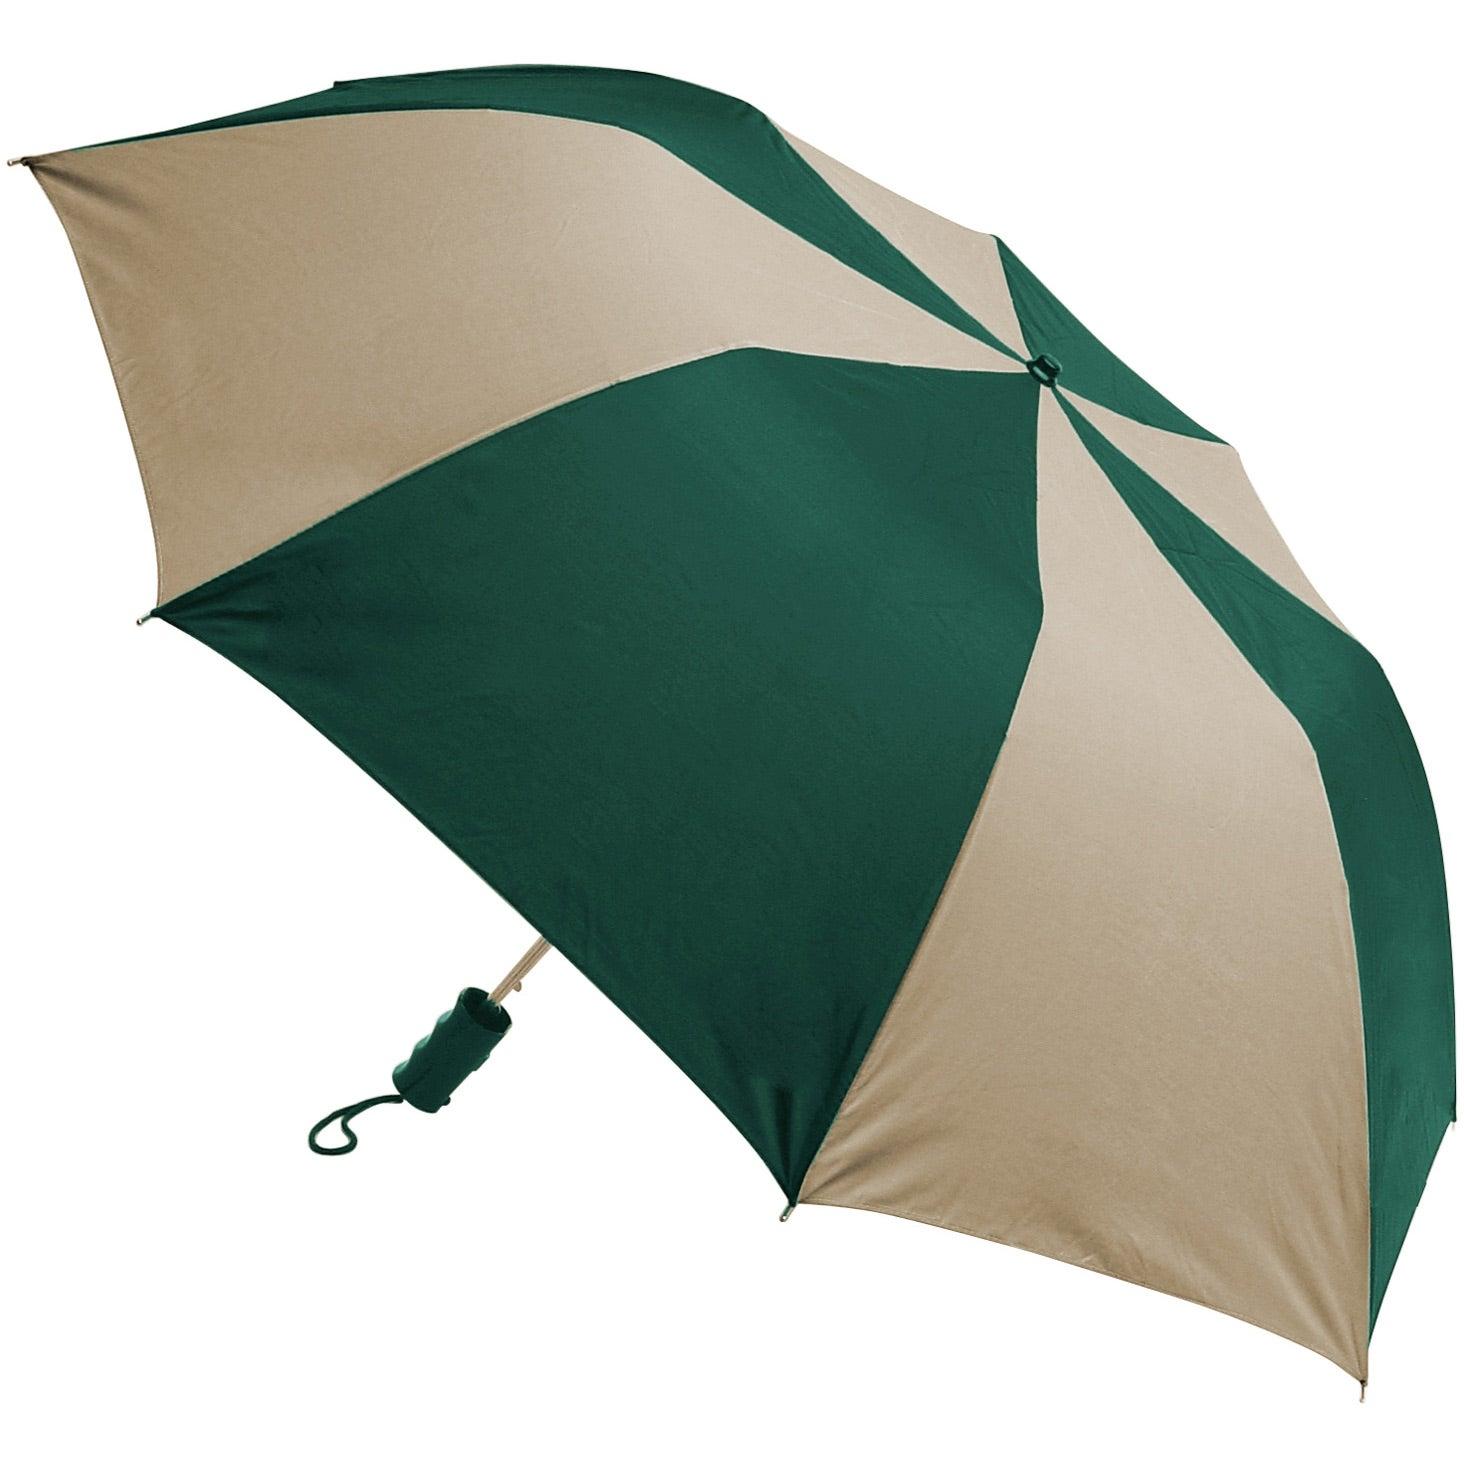 Promotional Barrister Auto-Open Folding Umbrellas with Custom Logo ...